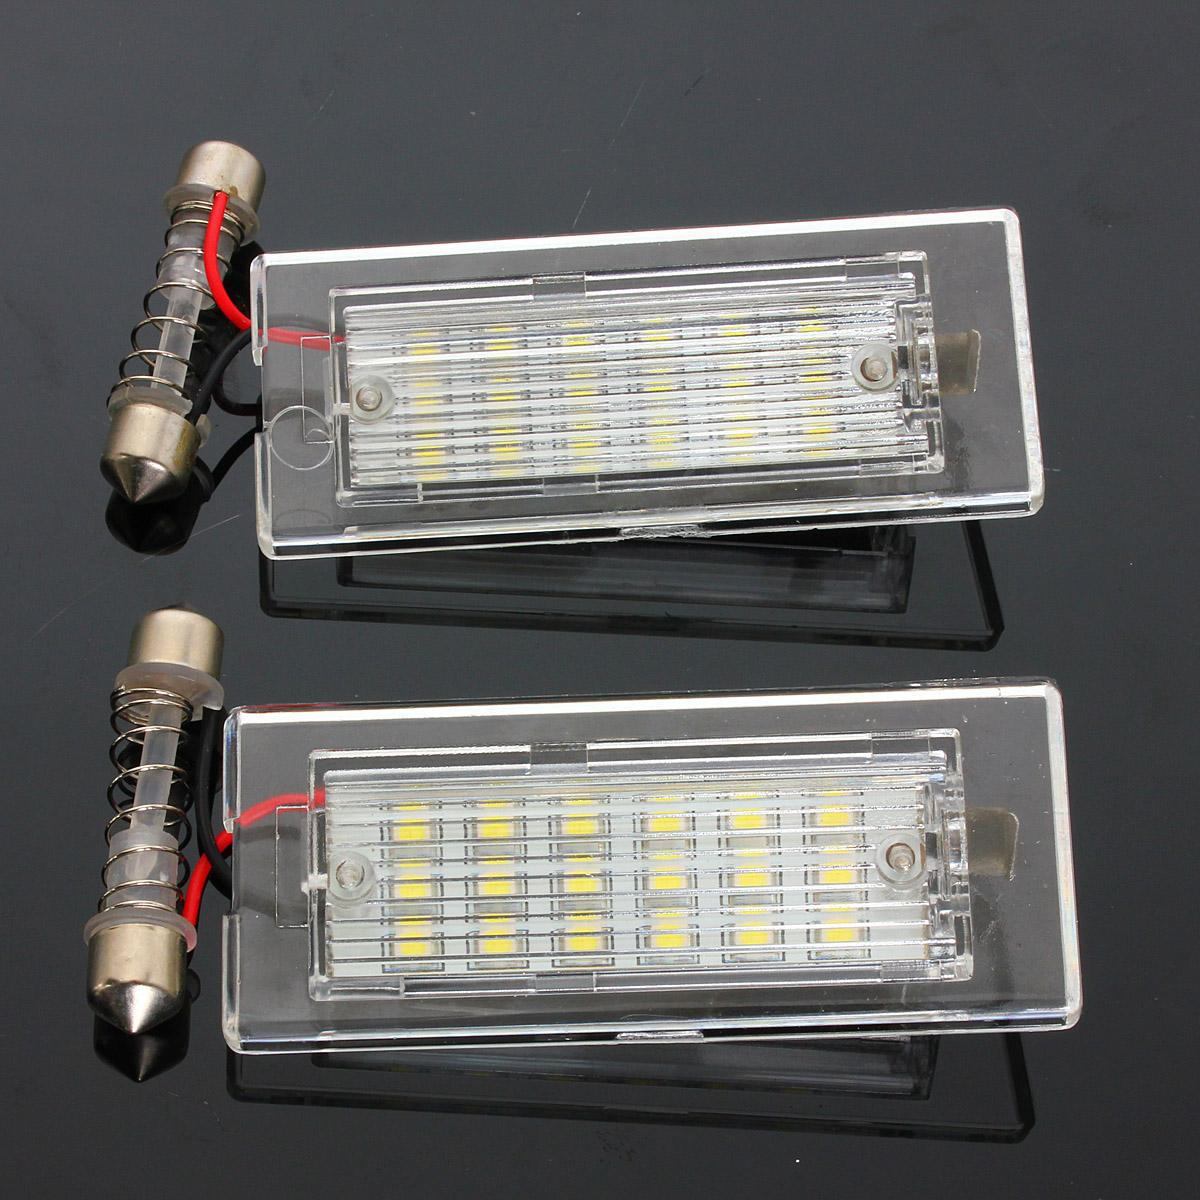 2X Lizenz Platte Licht 18 Led-lampen Auto Anzahl Platte Lampe Auto Styling Lichtquelle Für BMW X5 E53 X3 e83 2003 2004 2005 - 2010